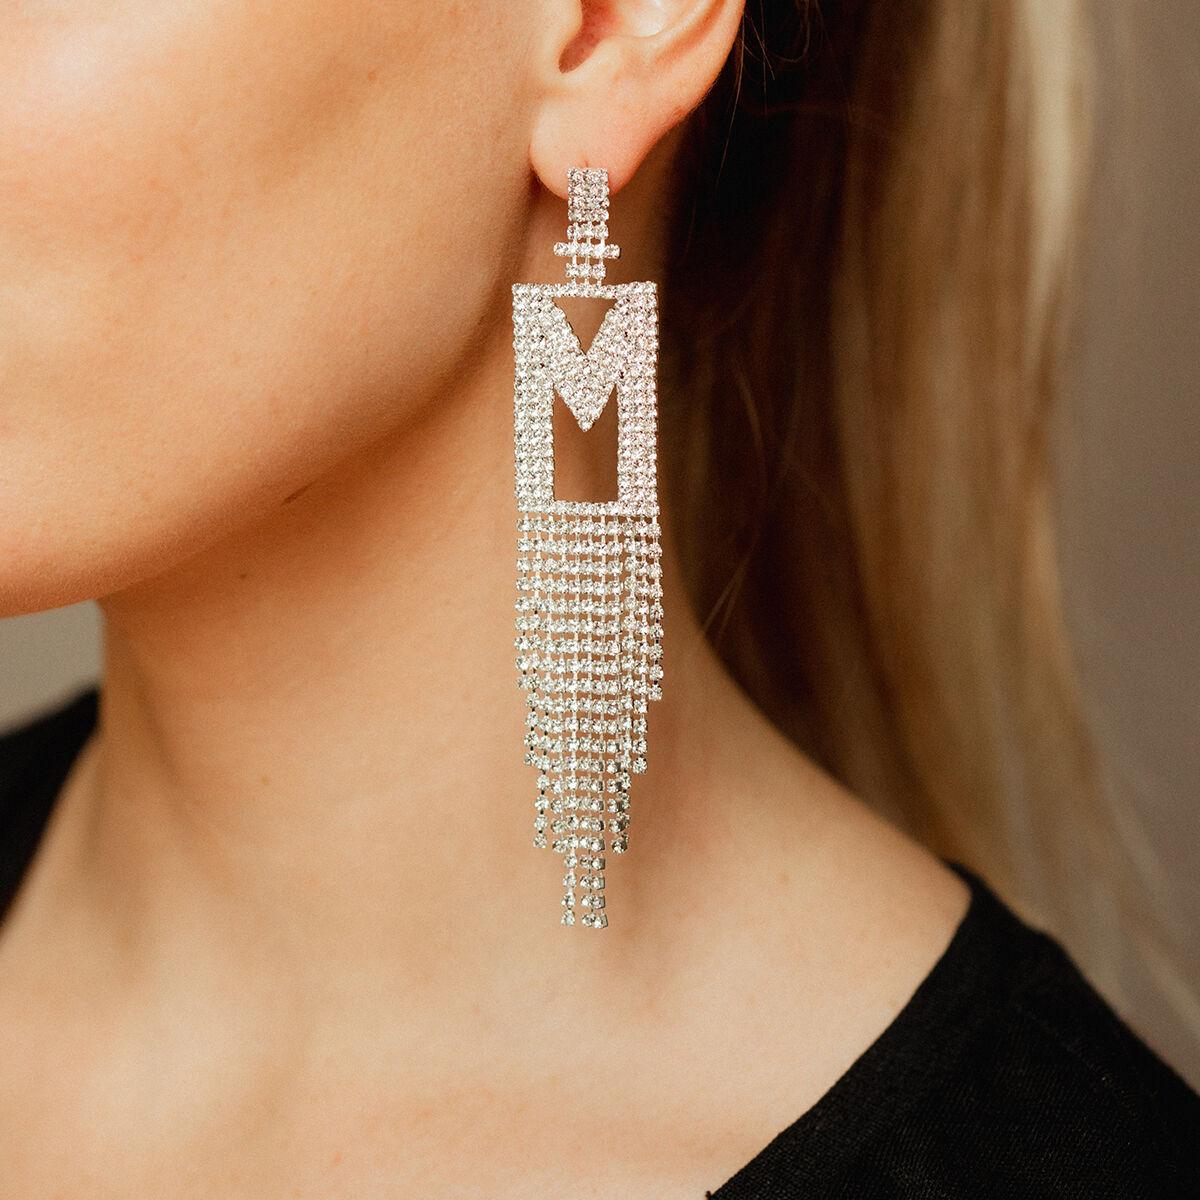 Double Festive Letter Earring Silverplated M